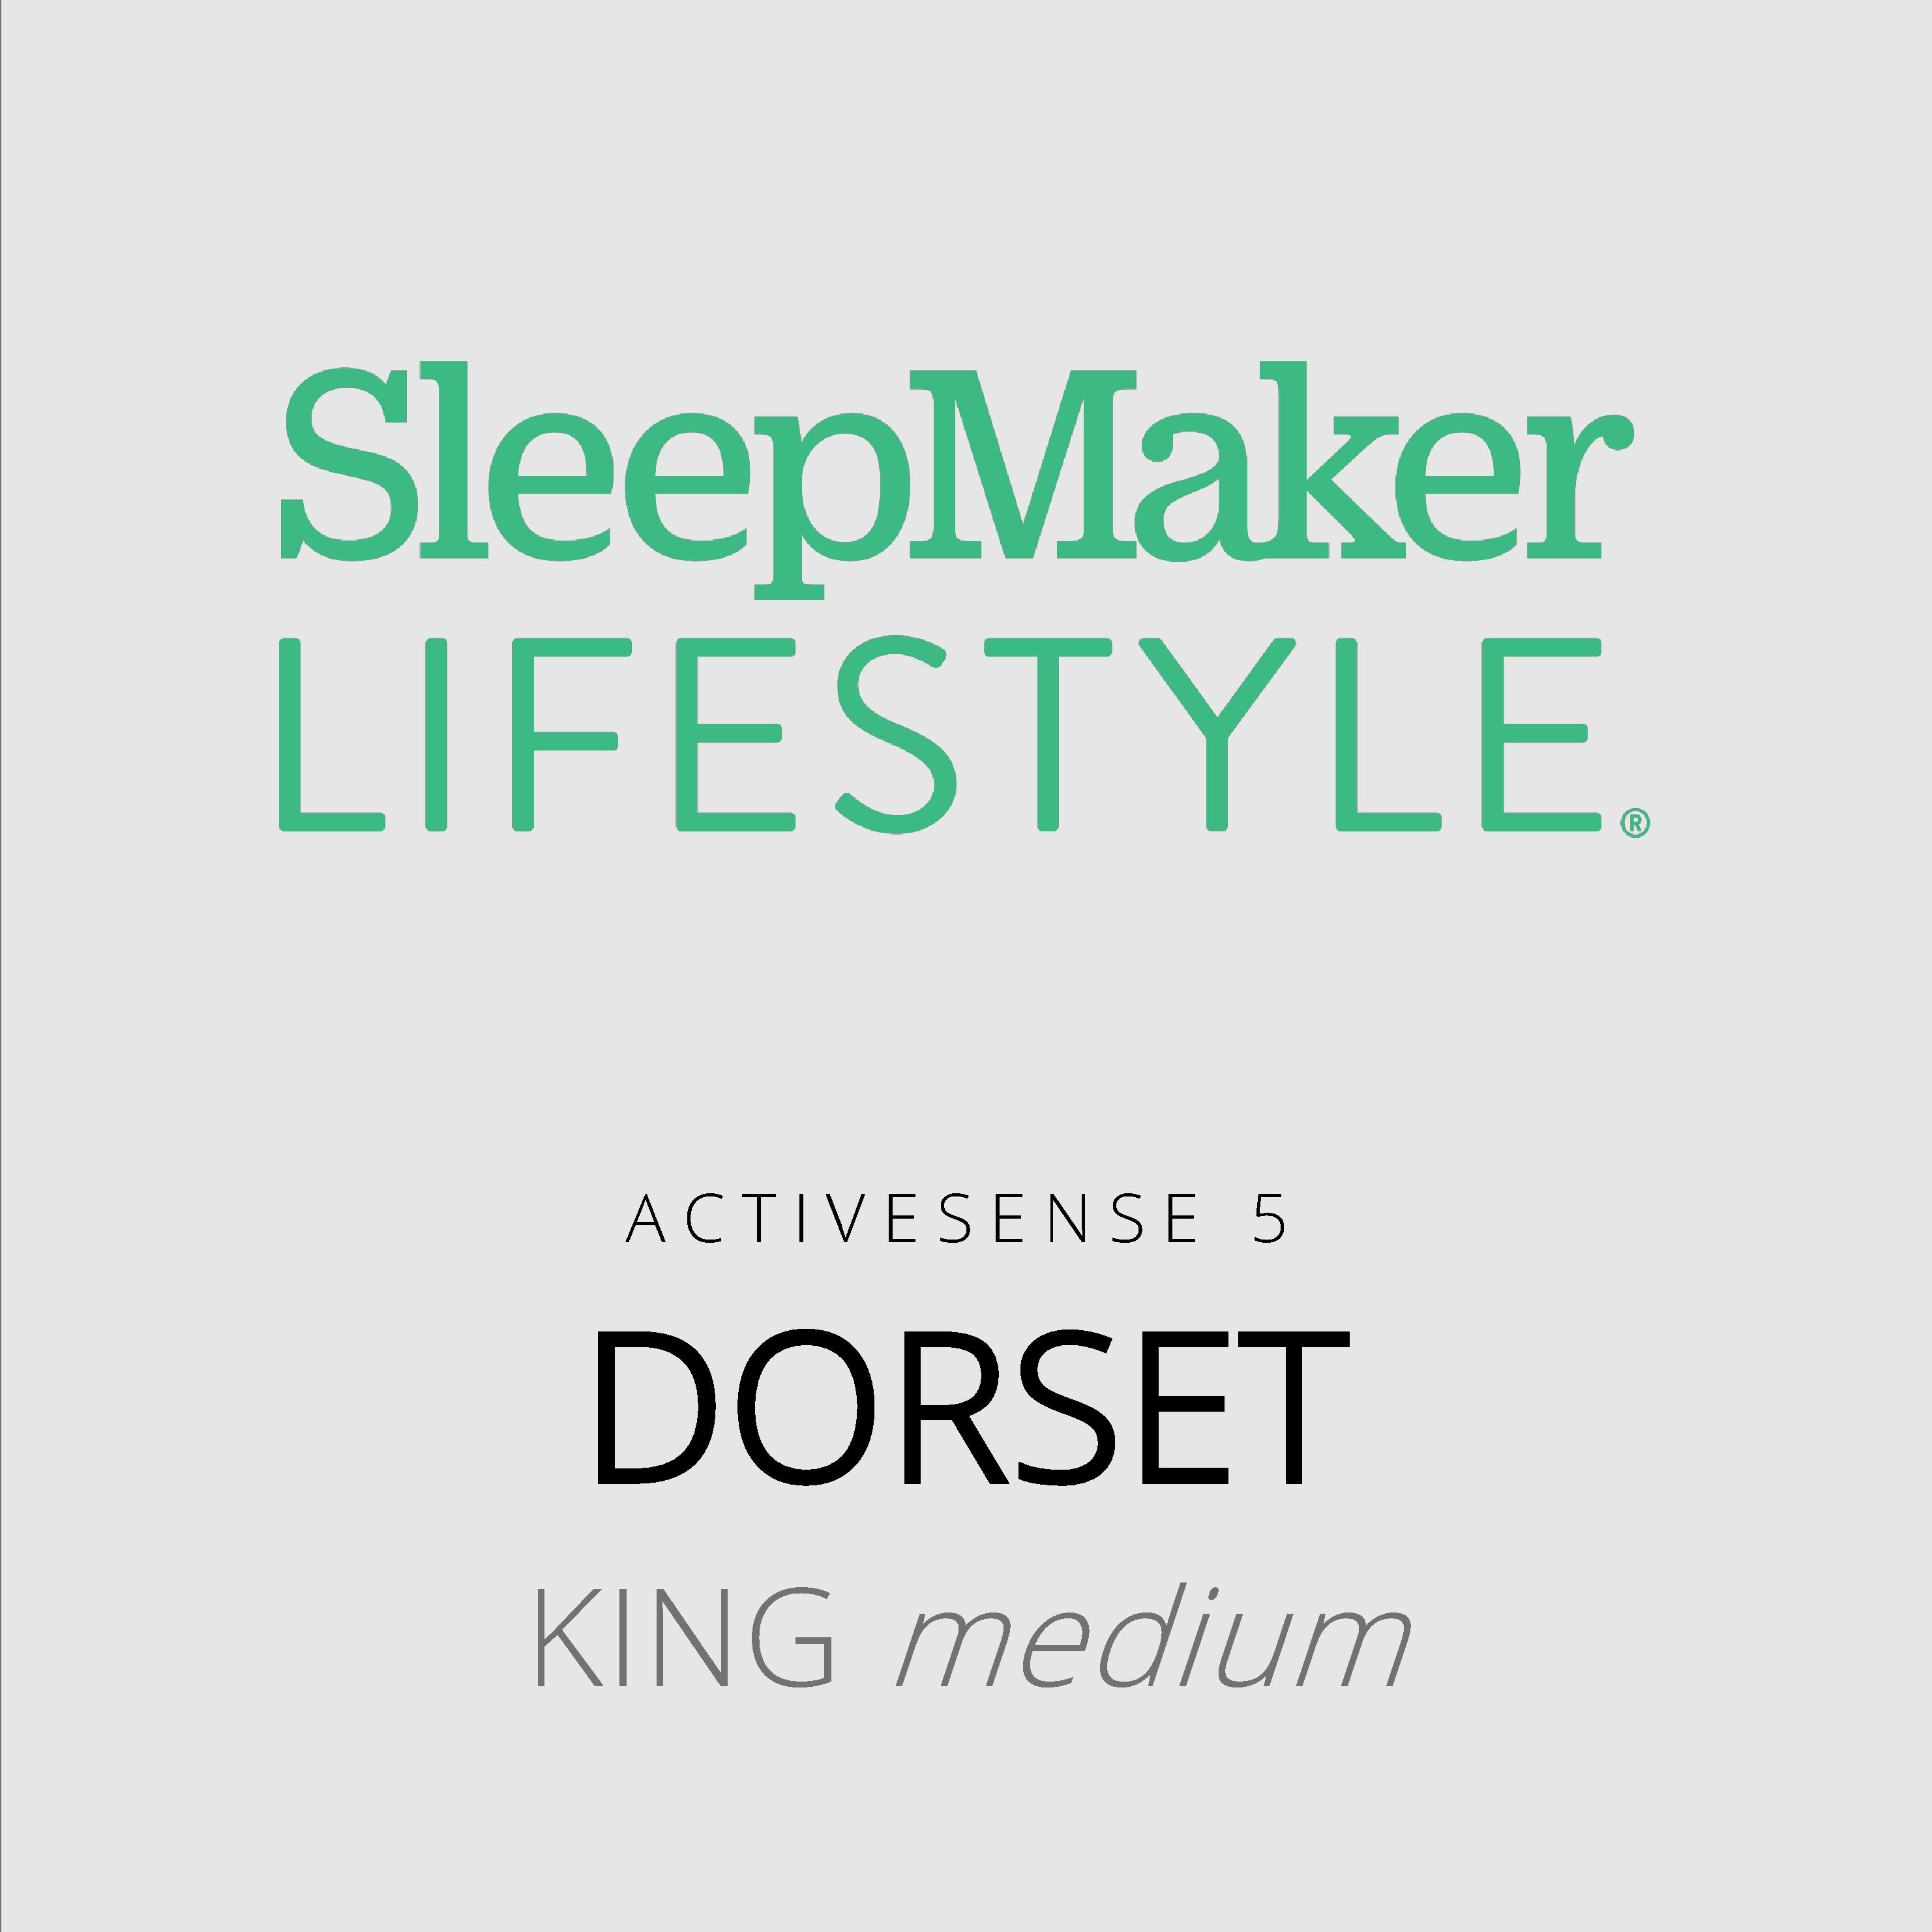 SleepMaker Lifestyle – Dorset – ActiveSense 5 – King Medium Mattress